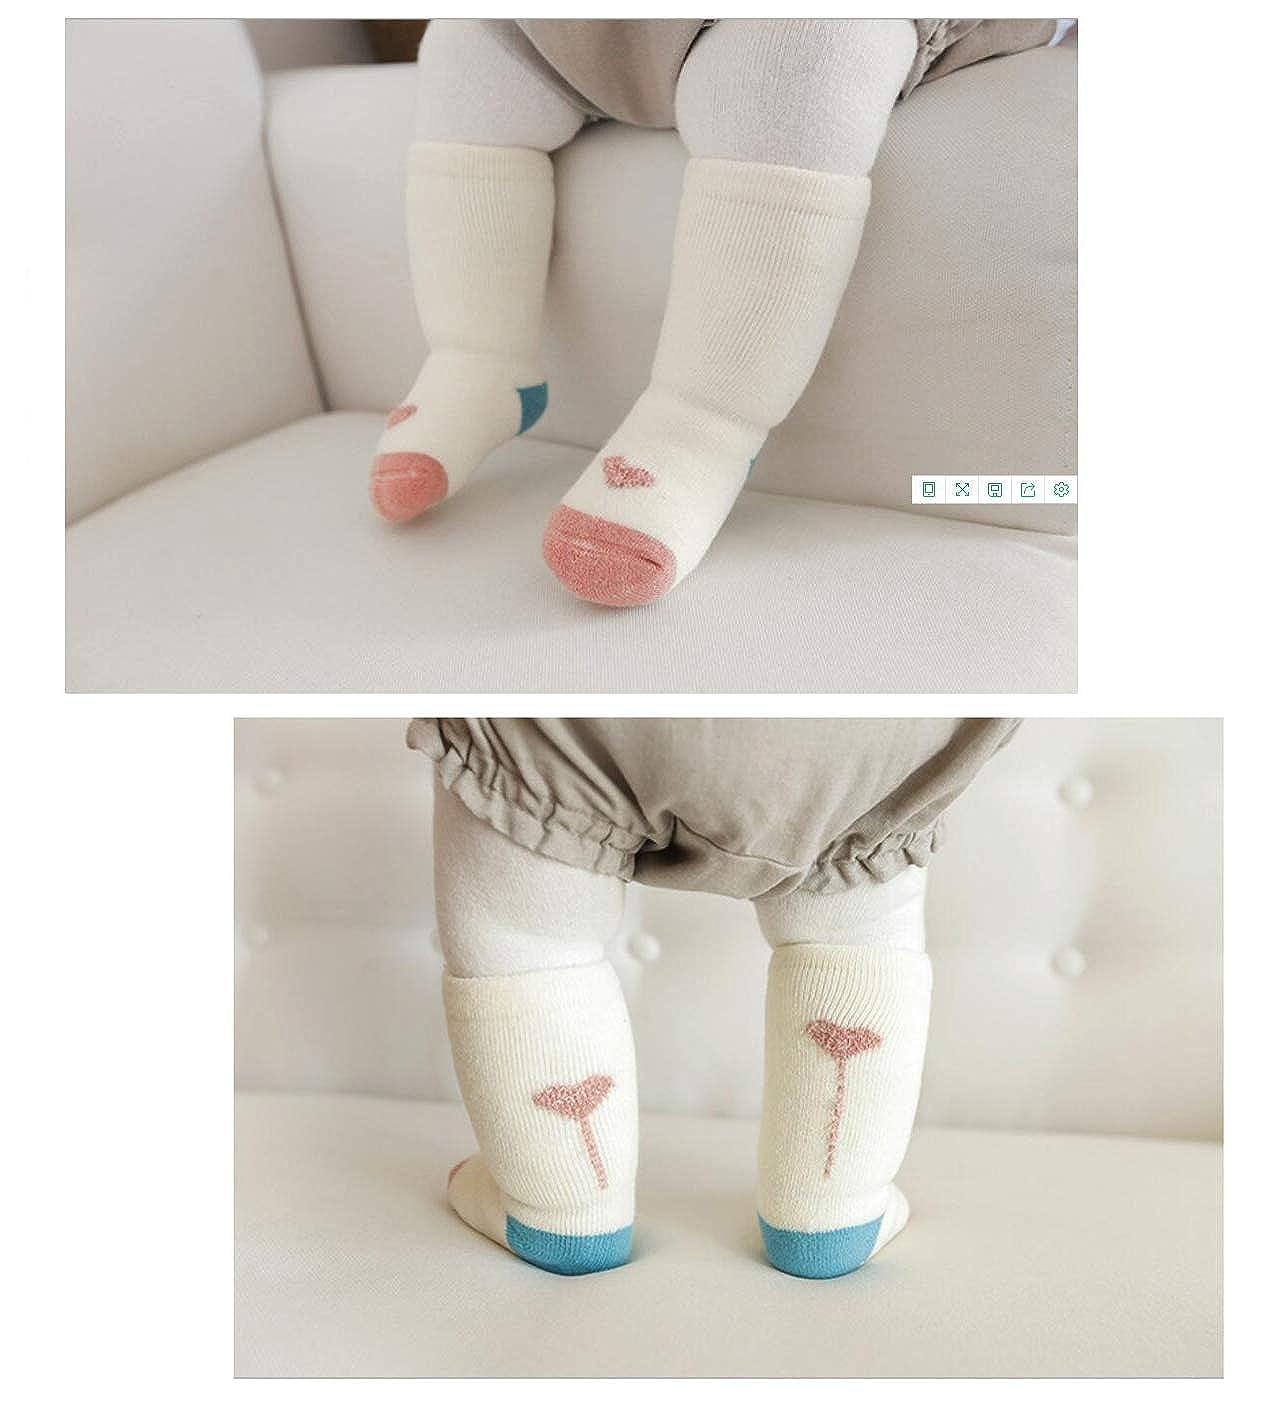 DEBAIJIA 3 Pair Set Baby Thick Socks Boys Girls Stockings Long Knee High Socks Anti-slip Coton Socks for 0-5 Years Newborn Kids Toddler Warm Fluffy Confortable Winter Autum Socks